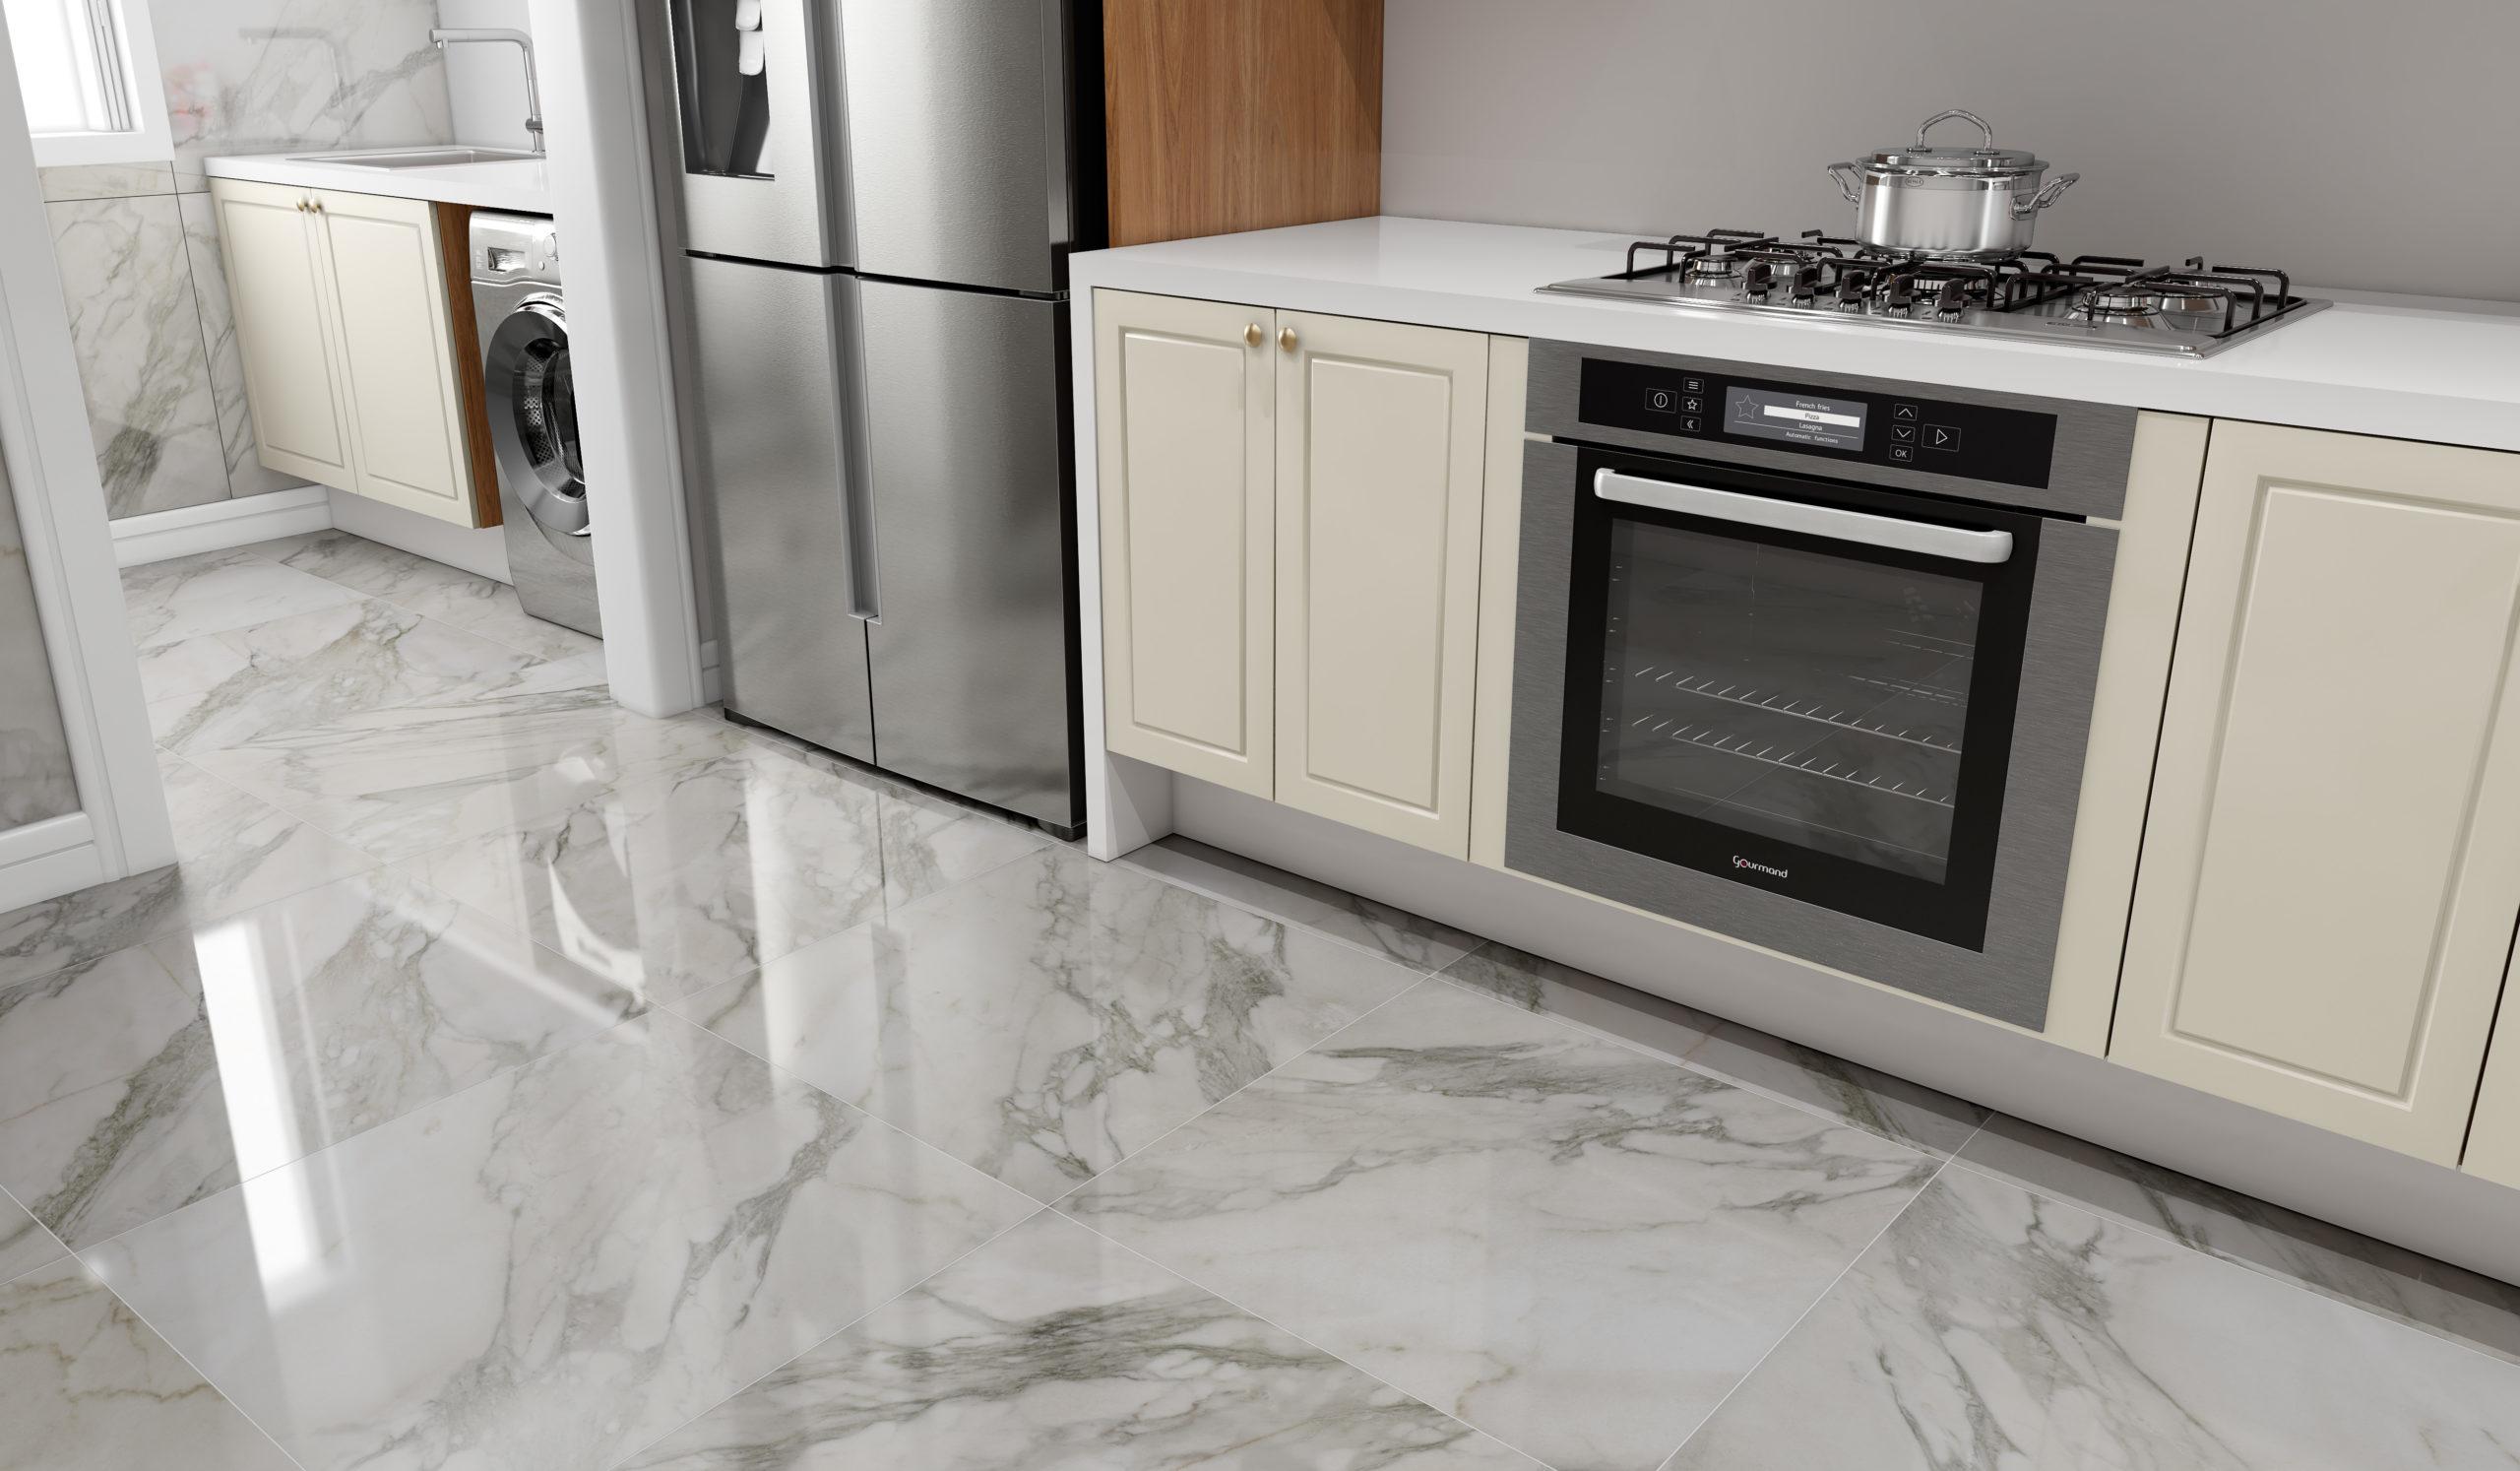 Piso Porcelanato Marmorizado Na Cozinha